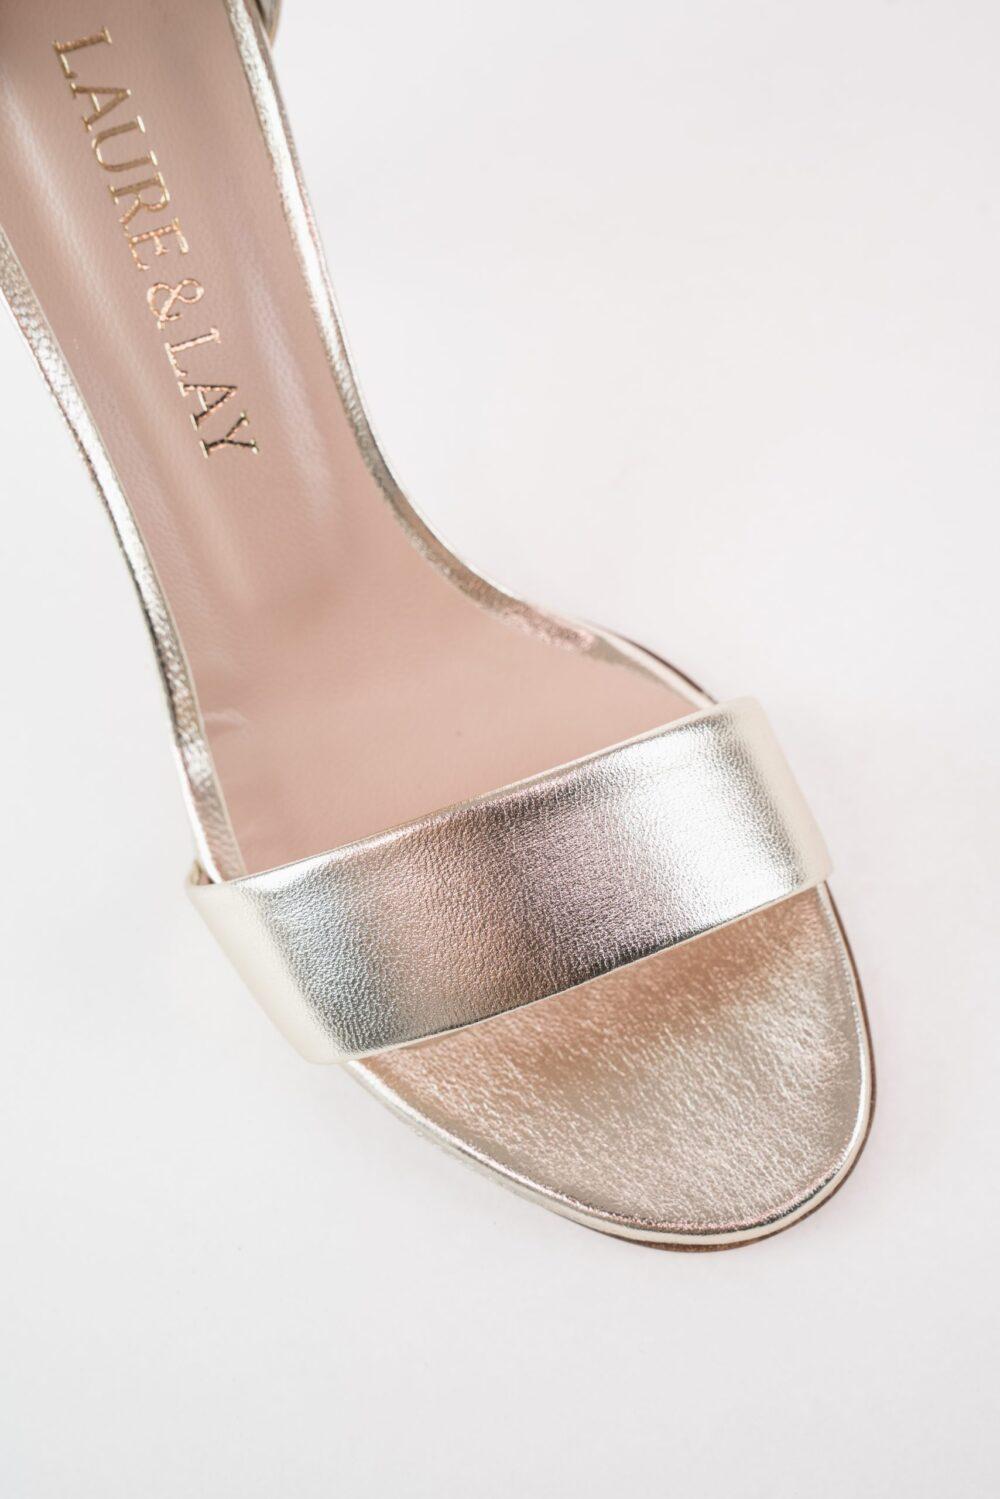 premium abendschuh gold metallic leder clara